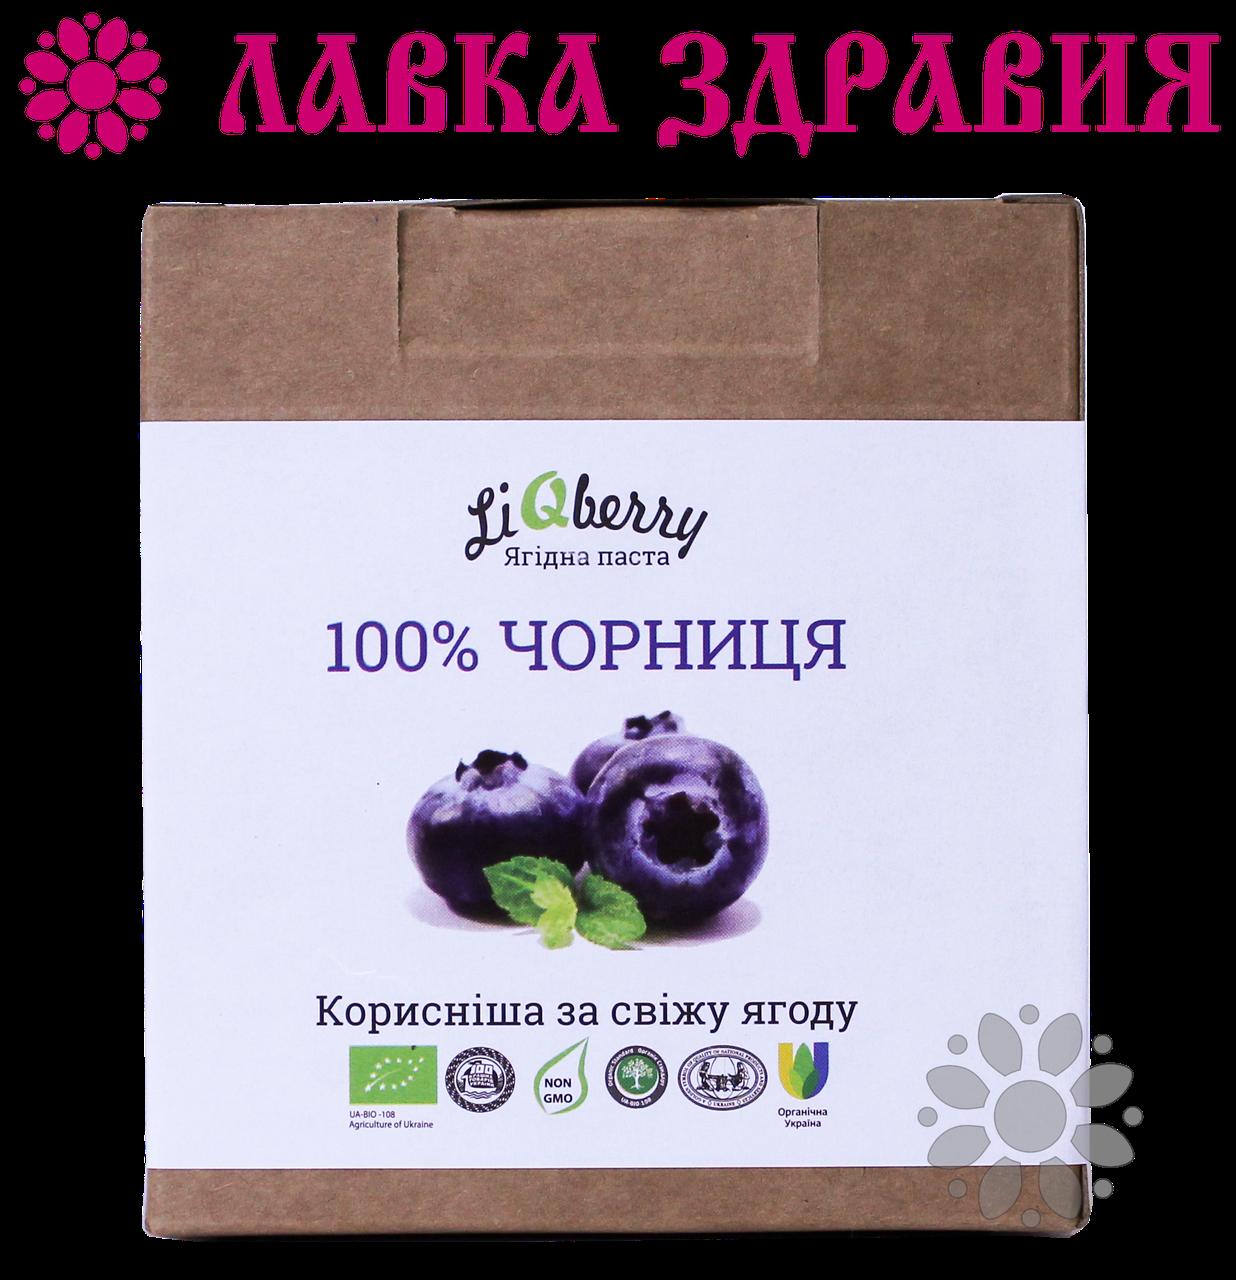 Черничная паста «LiQberry», 550 мл